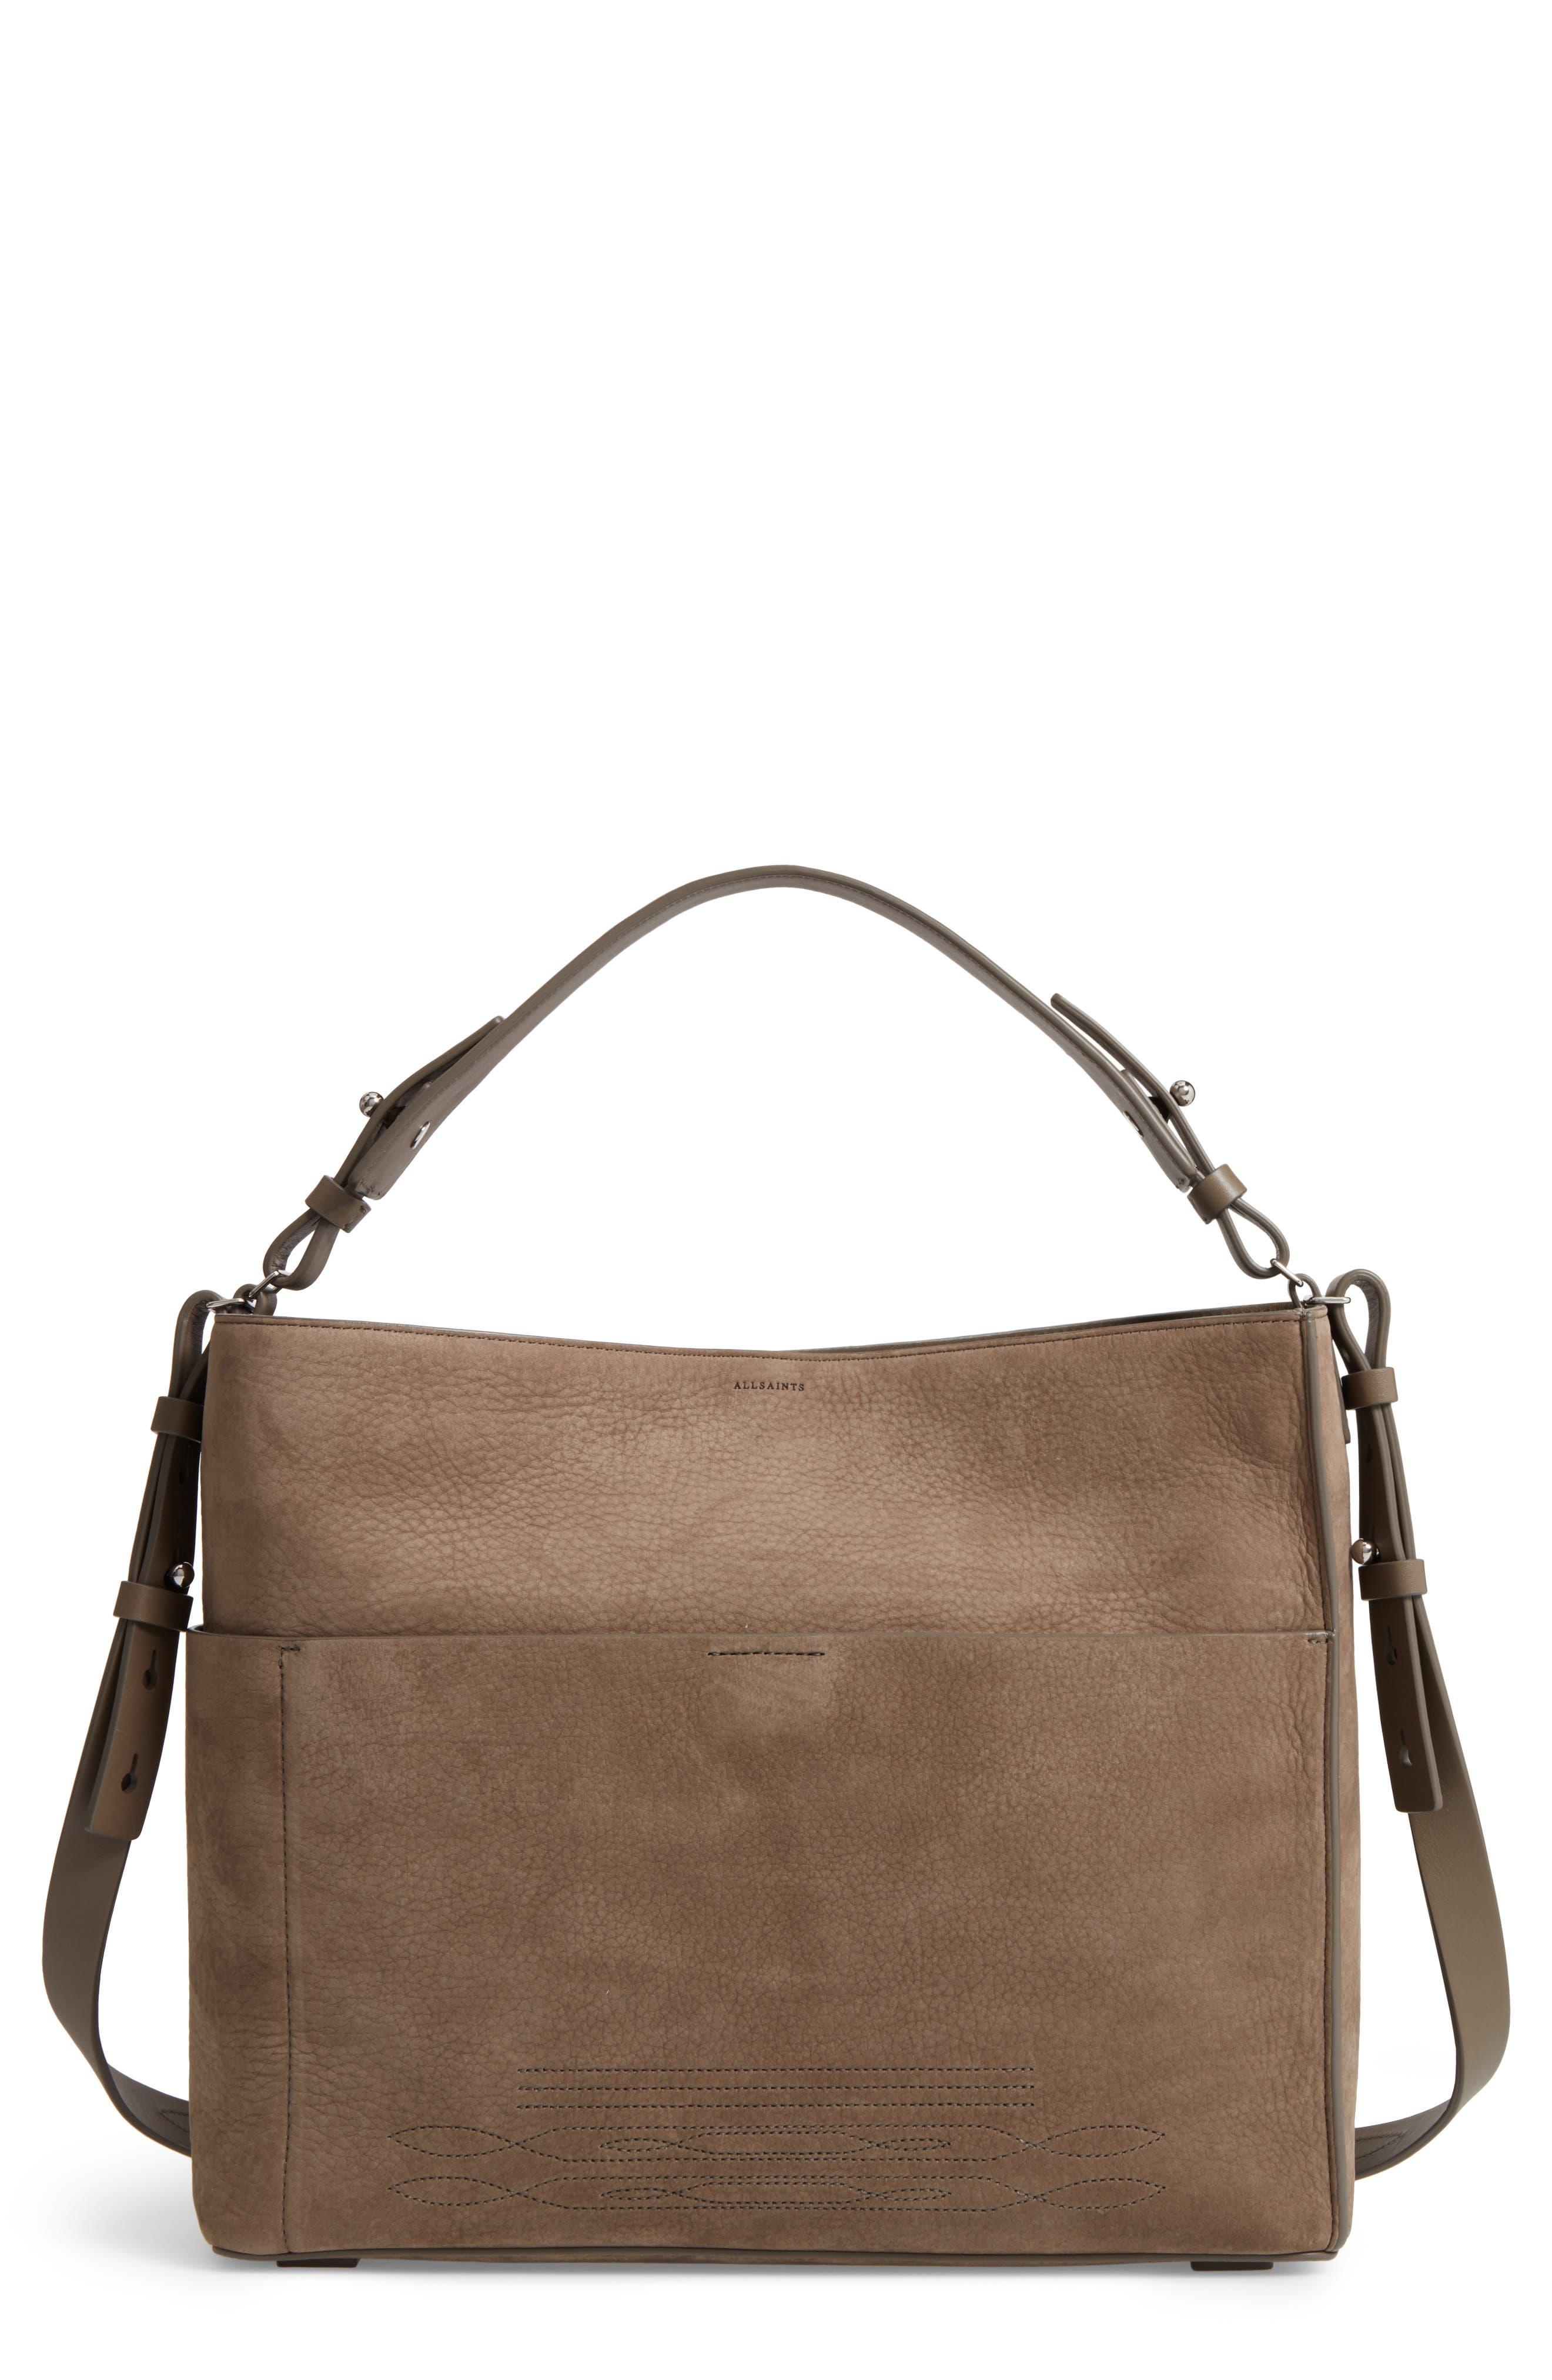 Main Image - ALLSAINTS Cooper Nubuck Calfskin Leather Tote